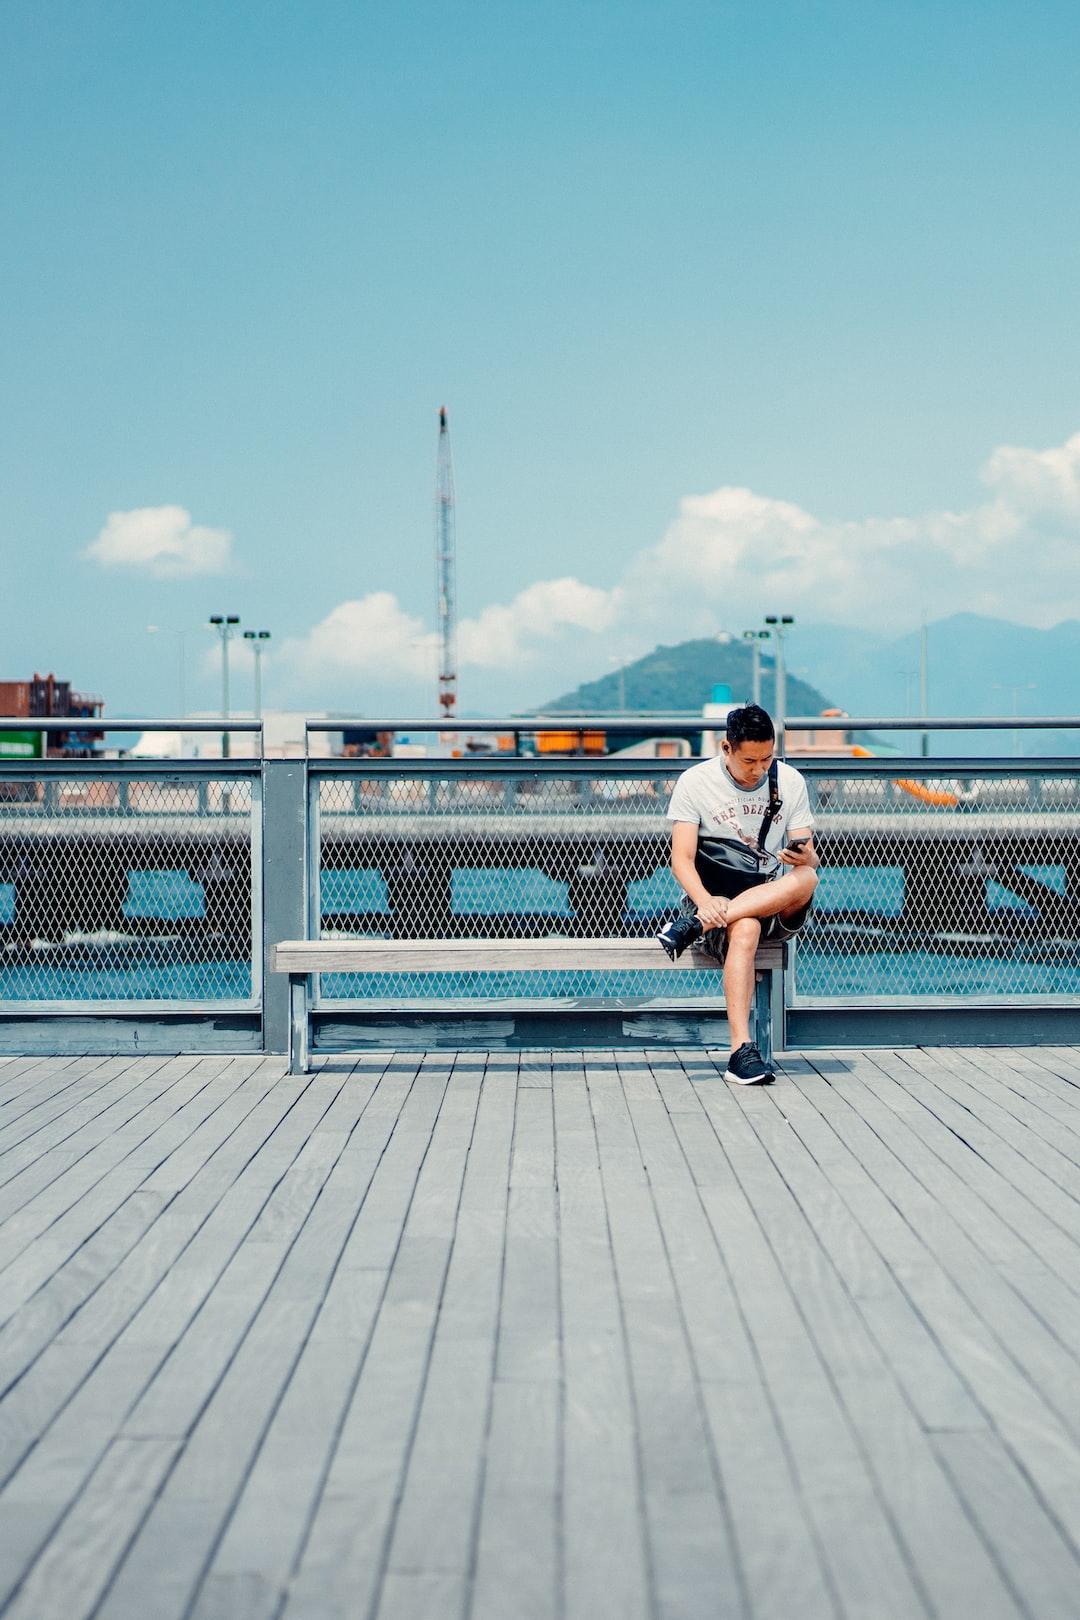 Scrolling Unsplash new feeds on Hk docks